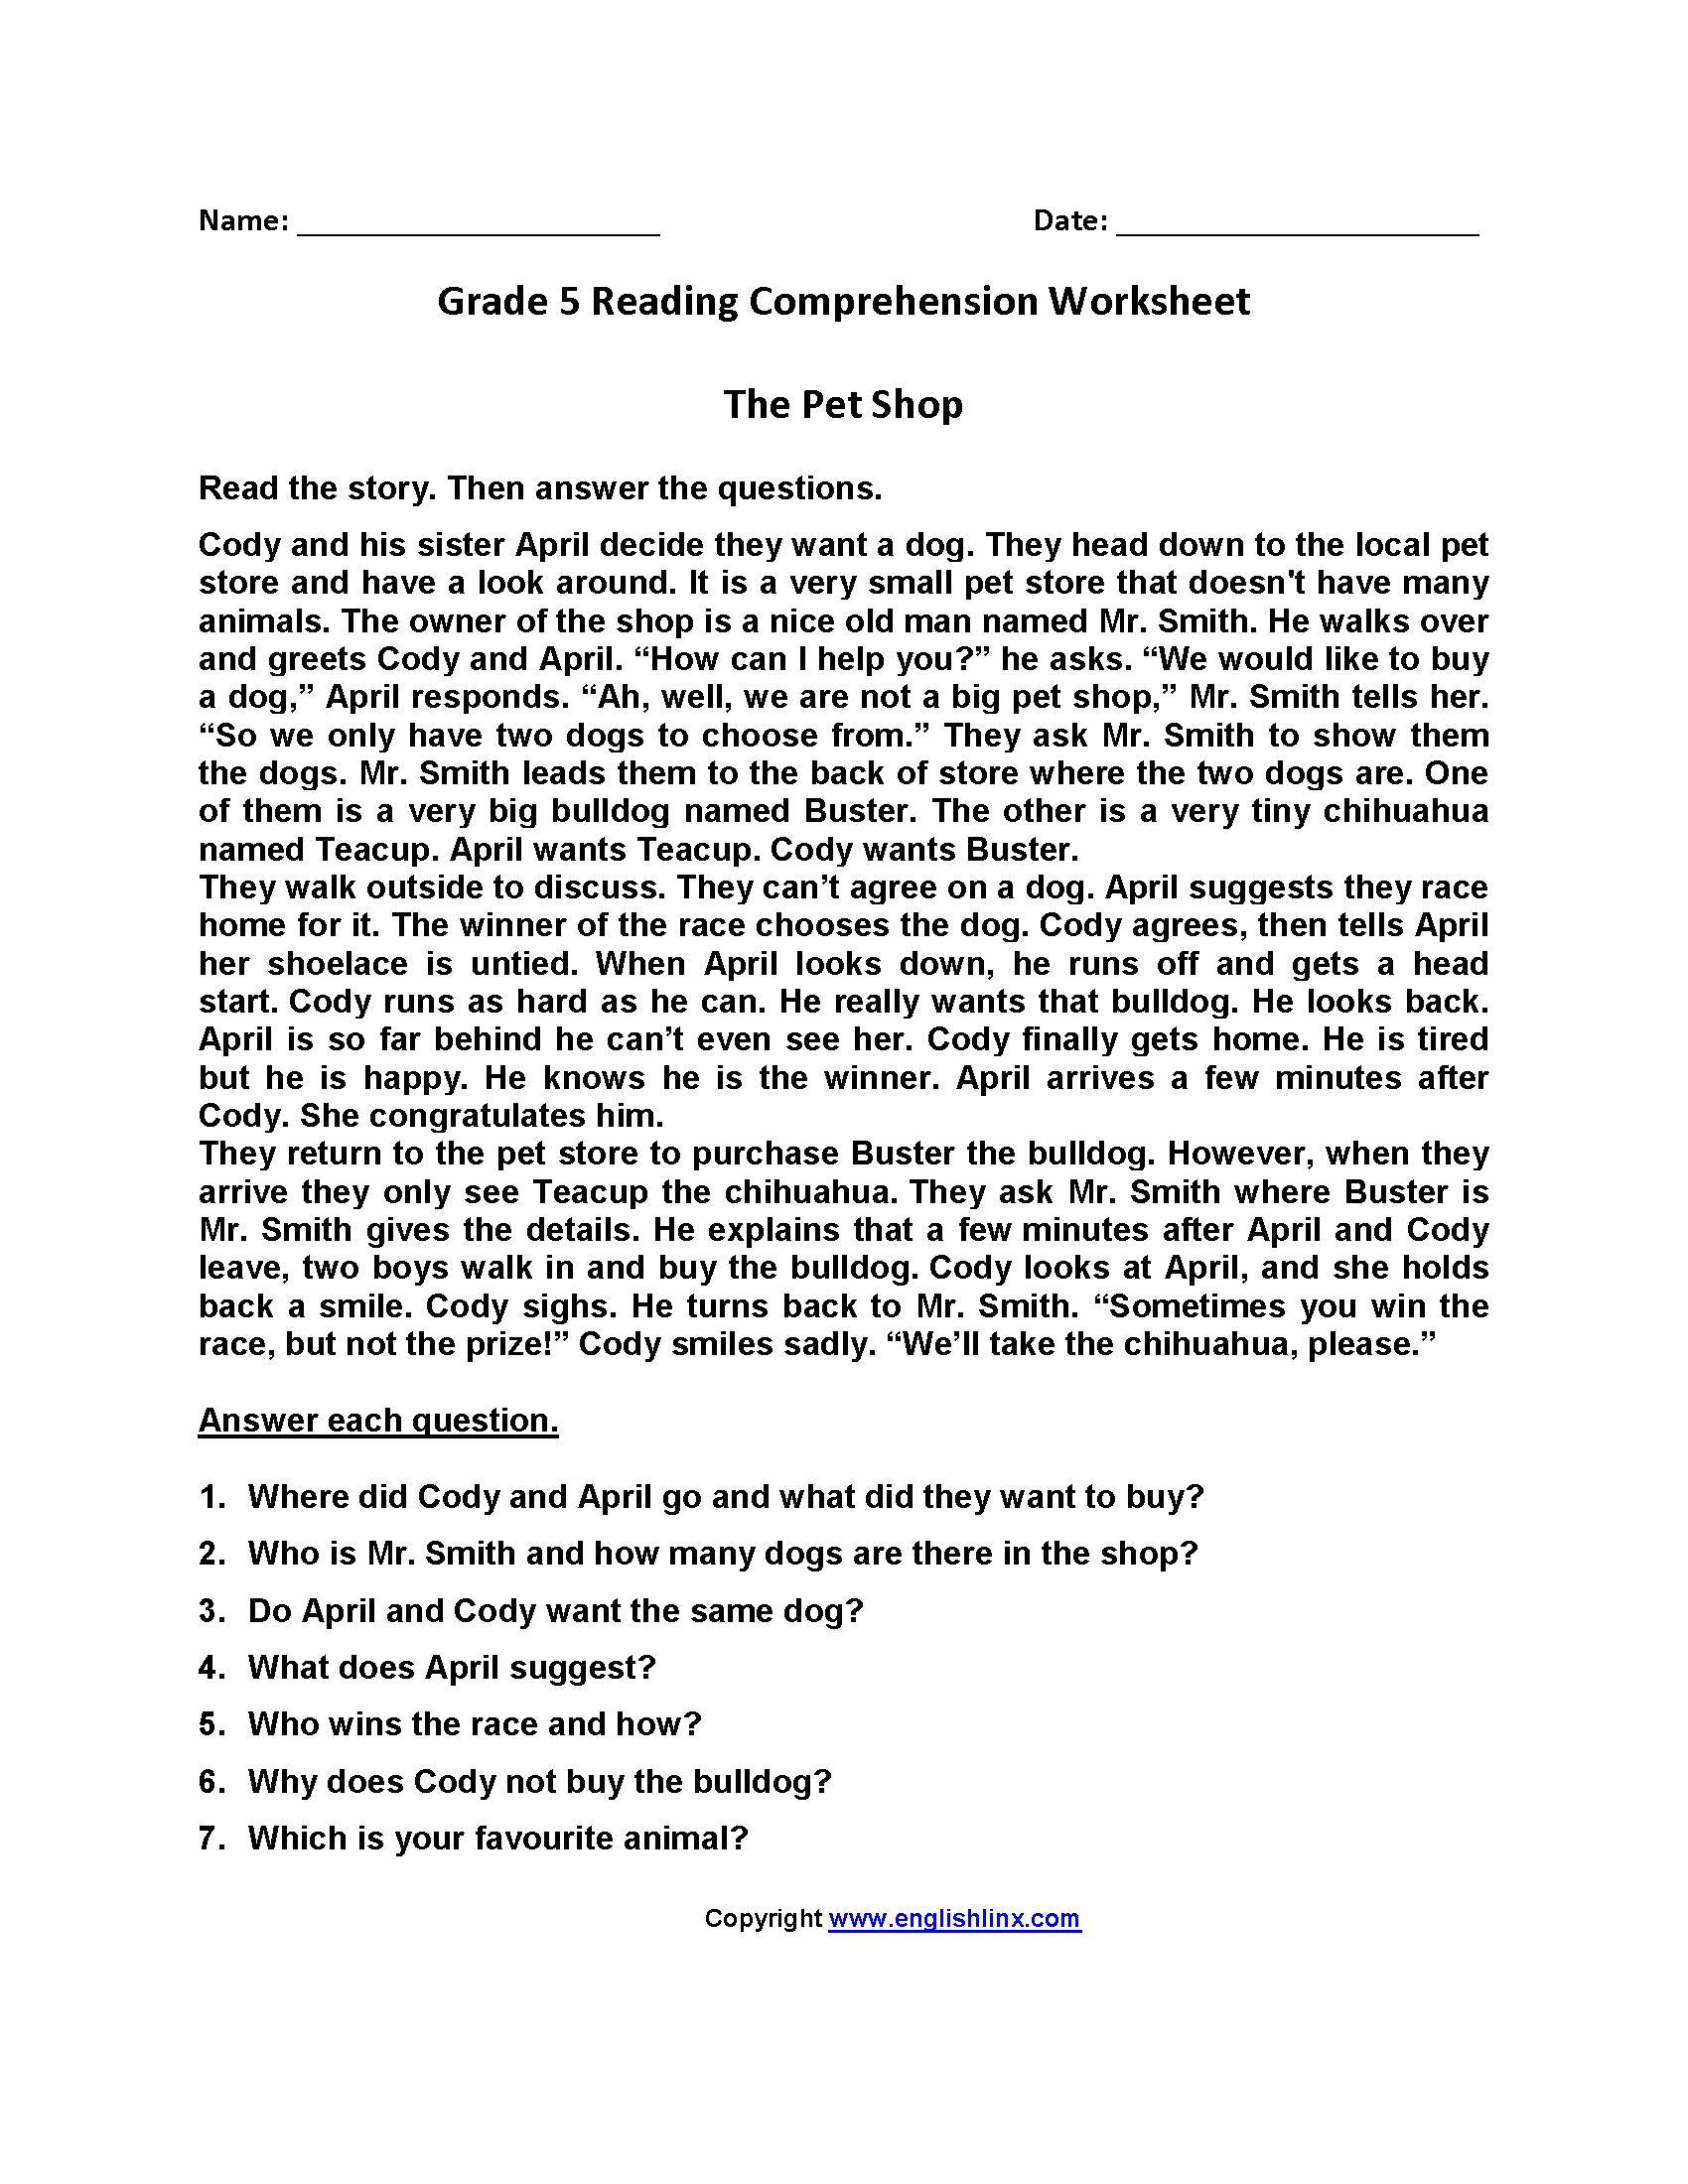 The Pet Shop Fifth Grade Reading Worksheets   Reading comprehension  worksheets [ 2200 x 1700 Pixel ]